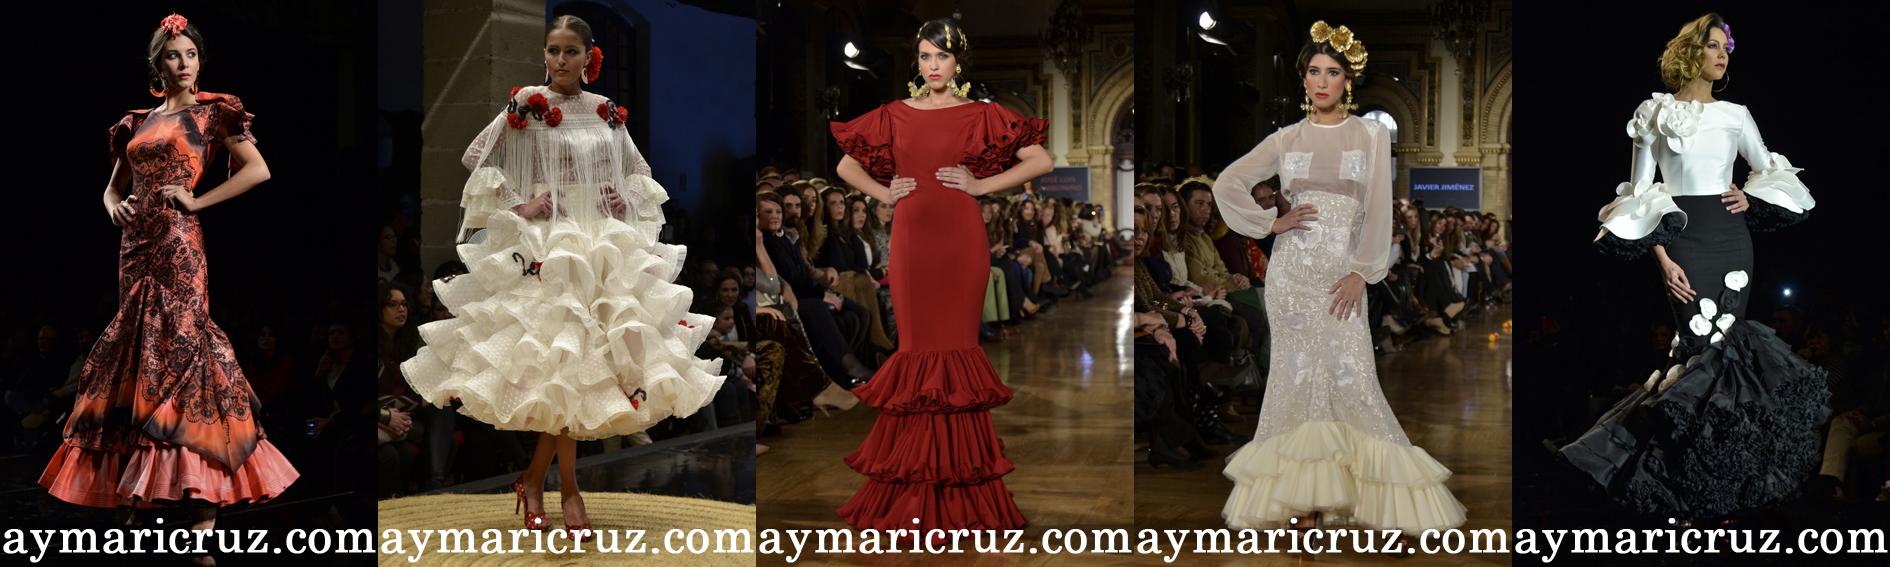 40 trajes para ir a la Feria de Sevilla 2014 (2ª parte)